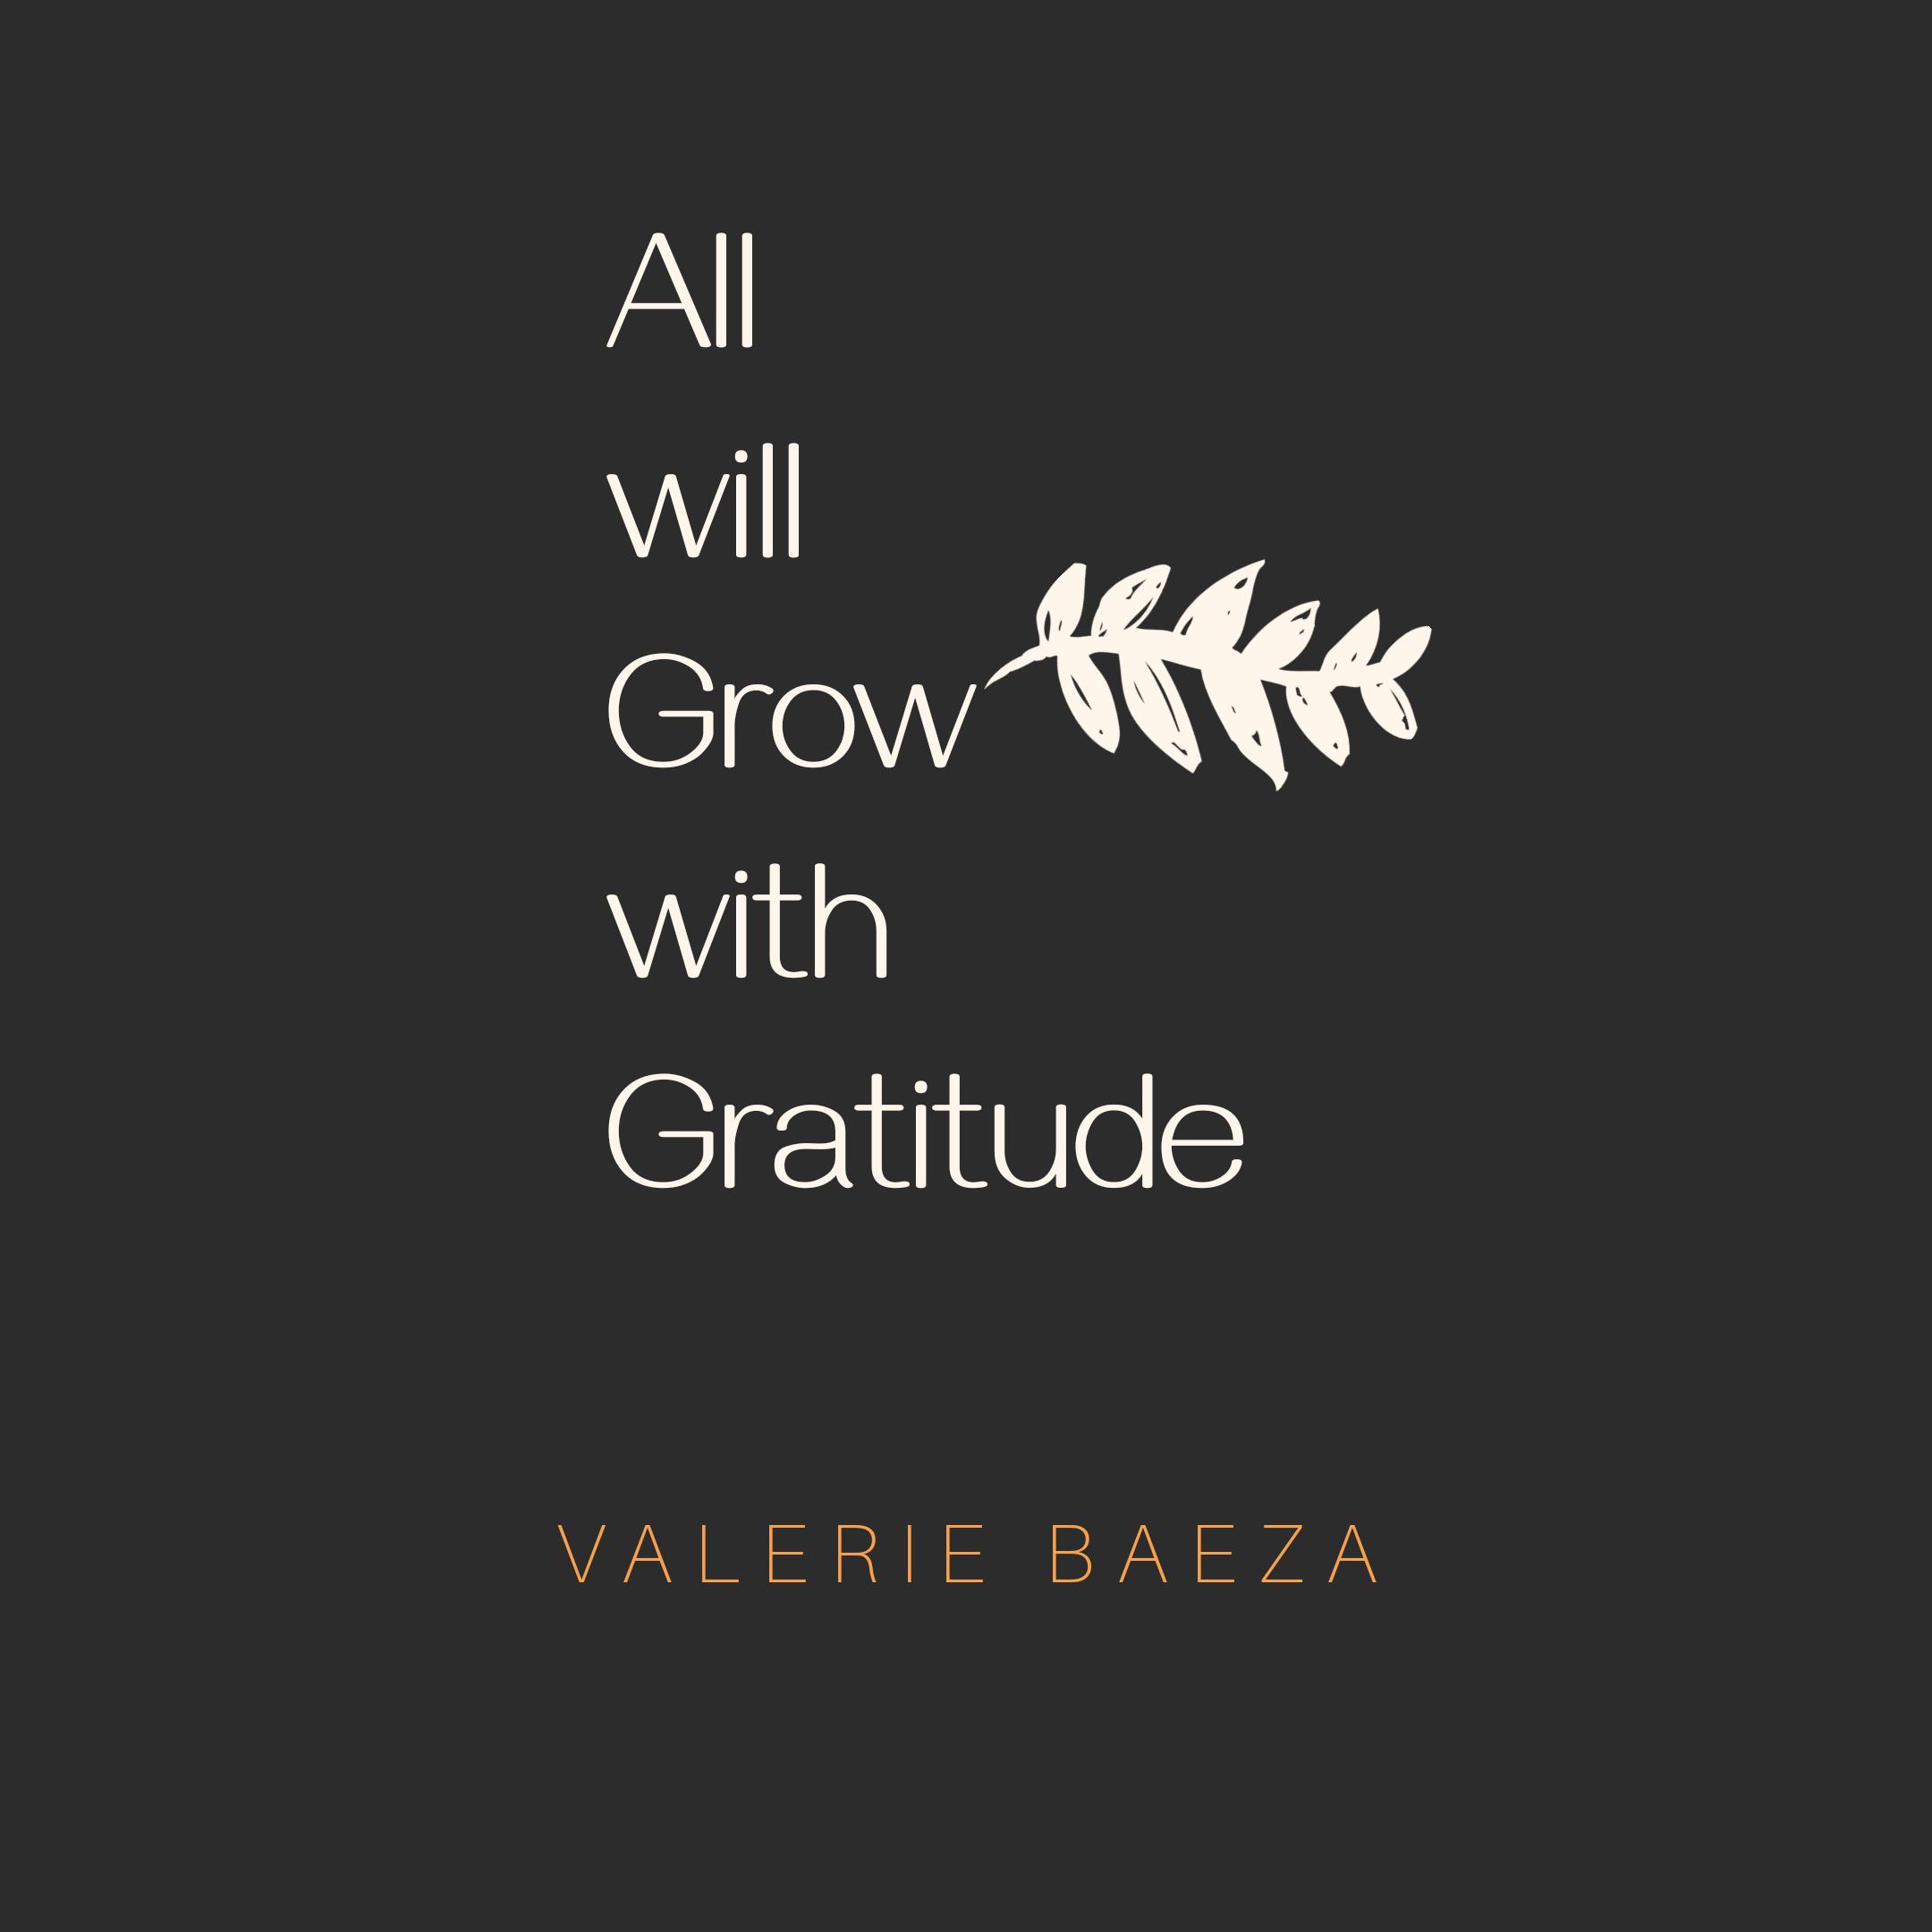 Gratitude Grows by Valerie Baeza